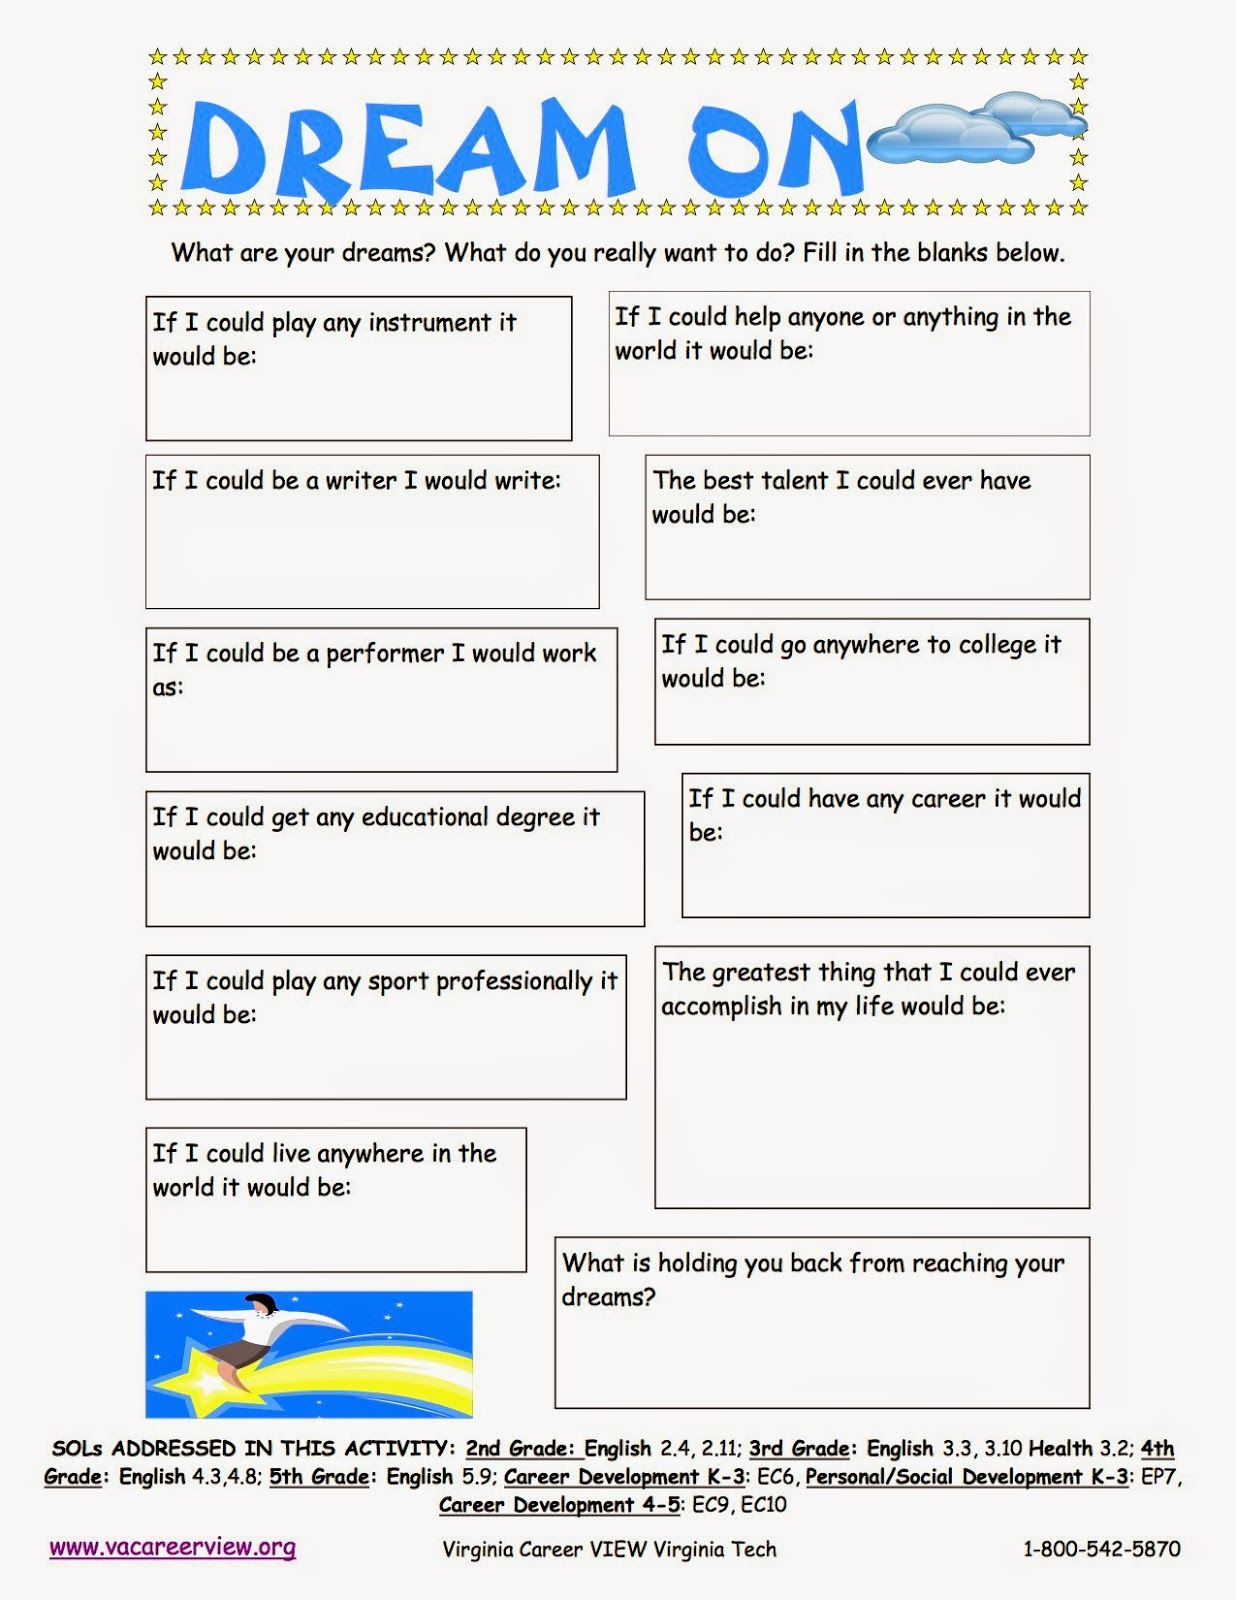 Career Worksheets For Elementary Students Worksheets